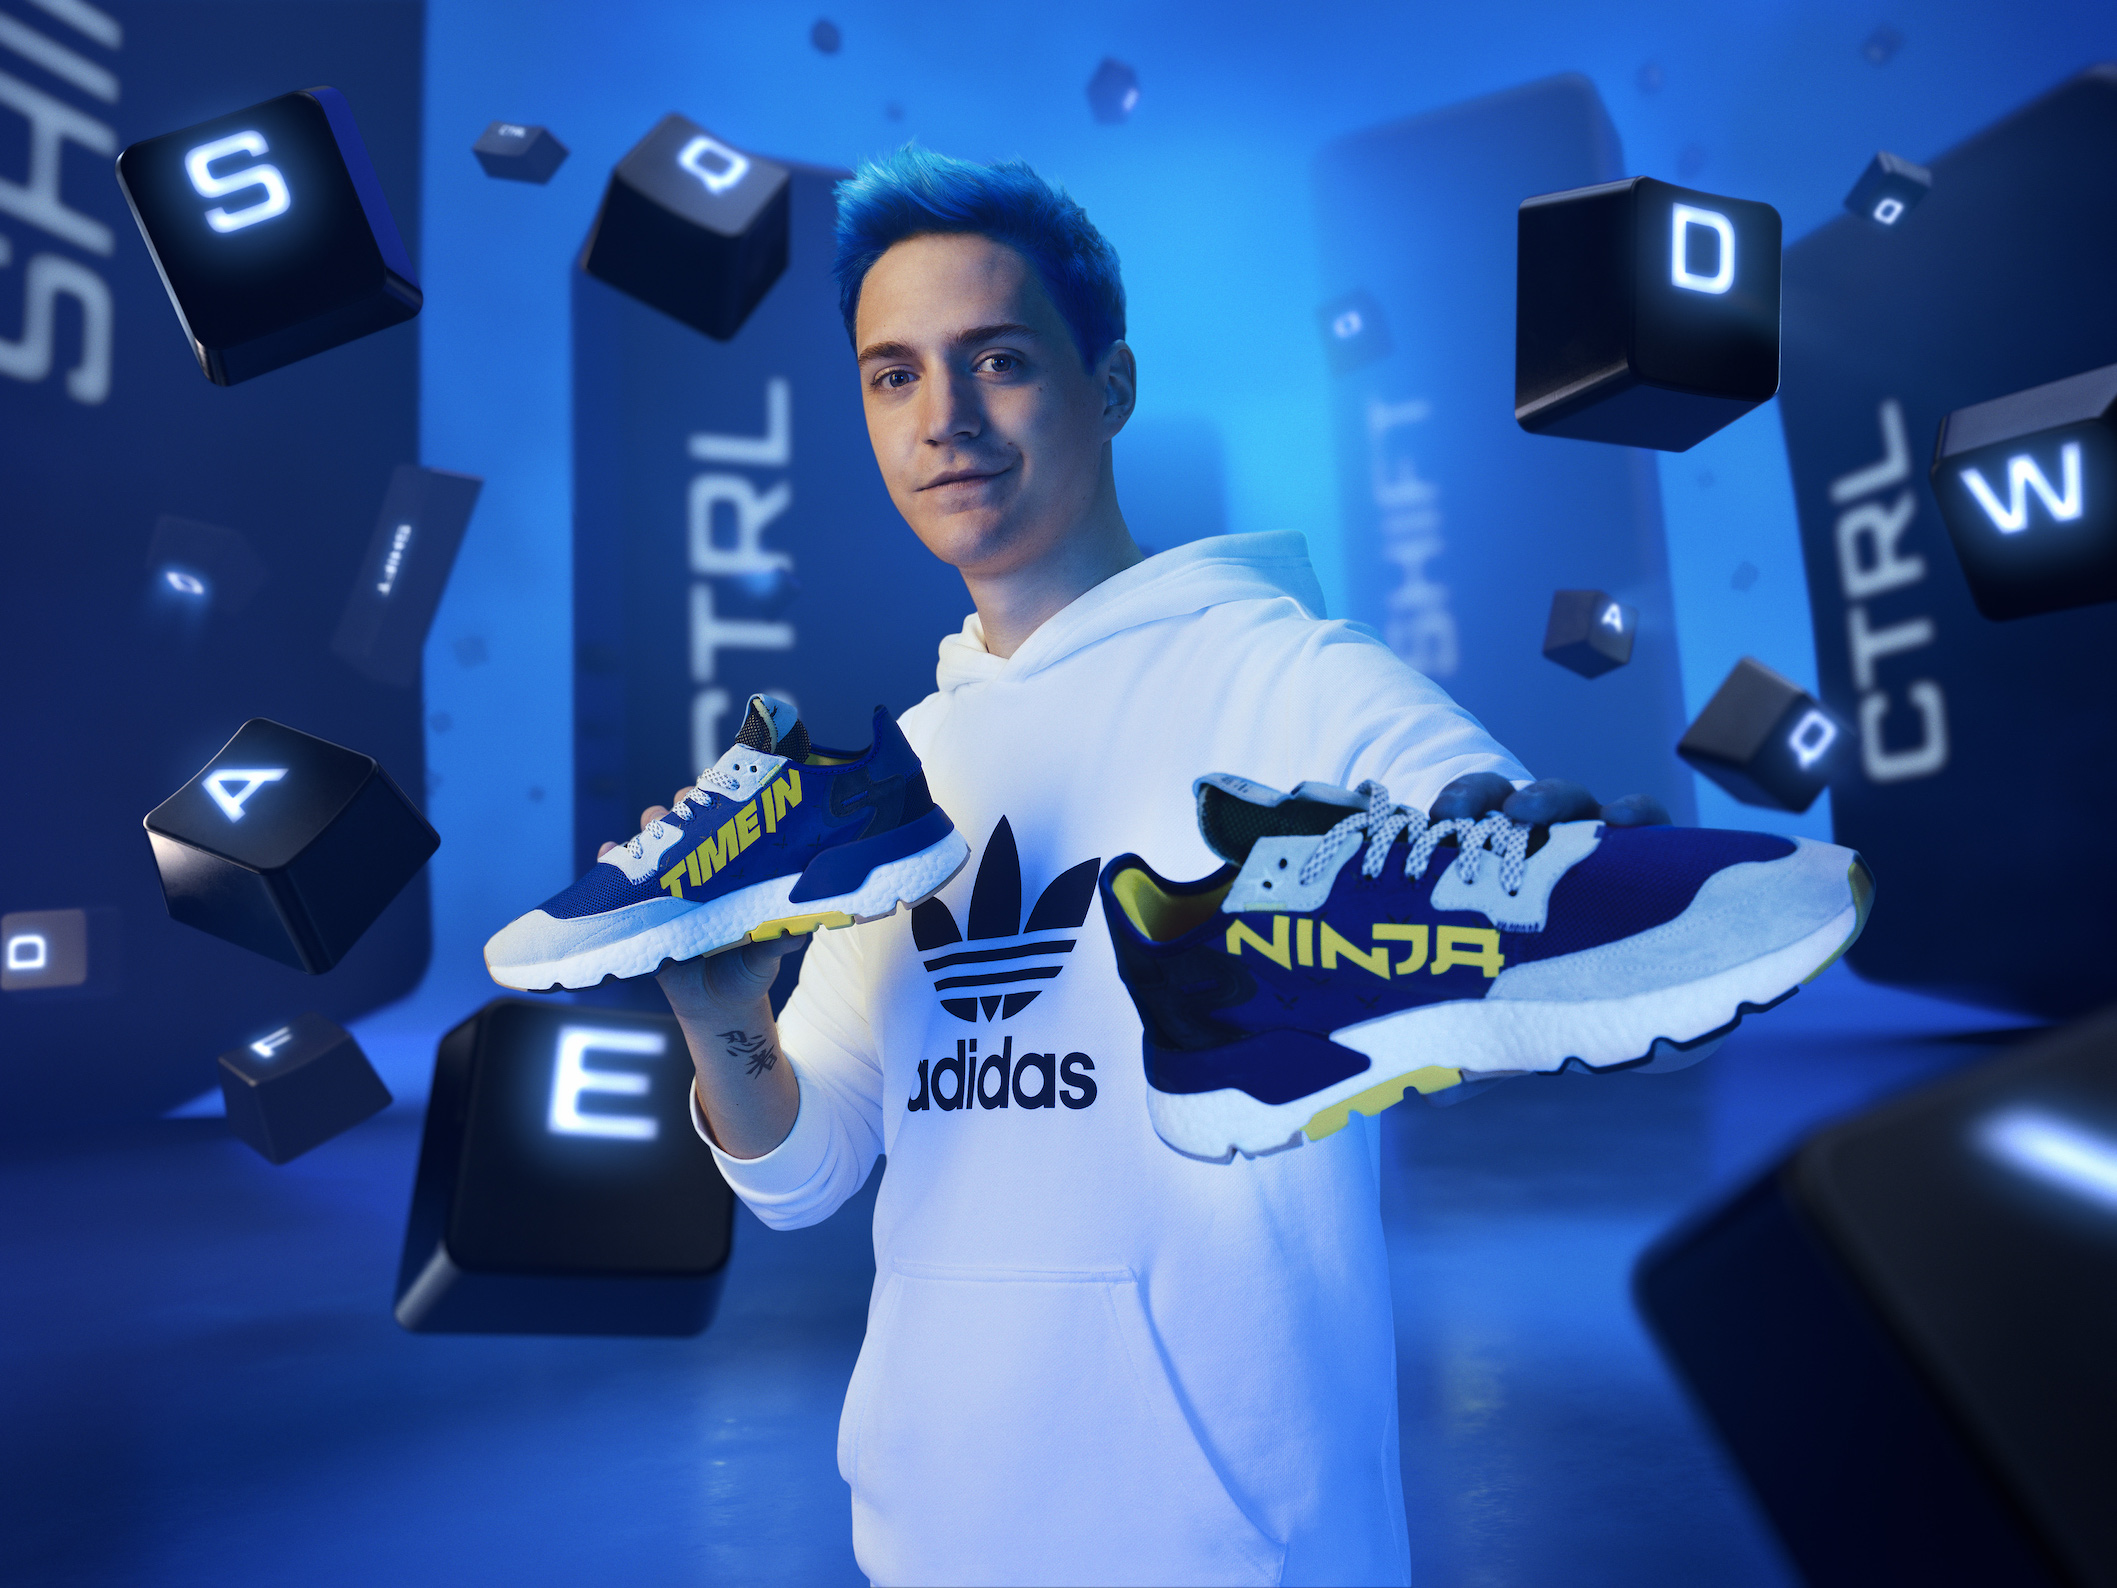 adidas、人気ゲーマーNinjaとのコラボシューズ発売